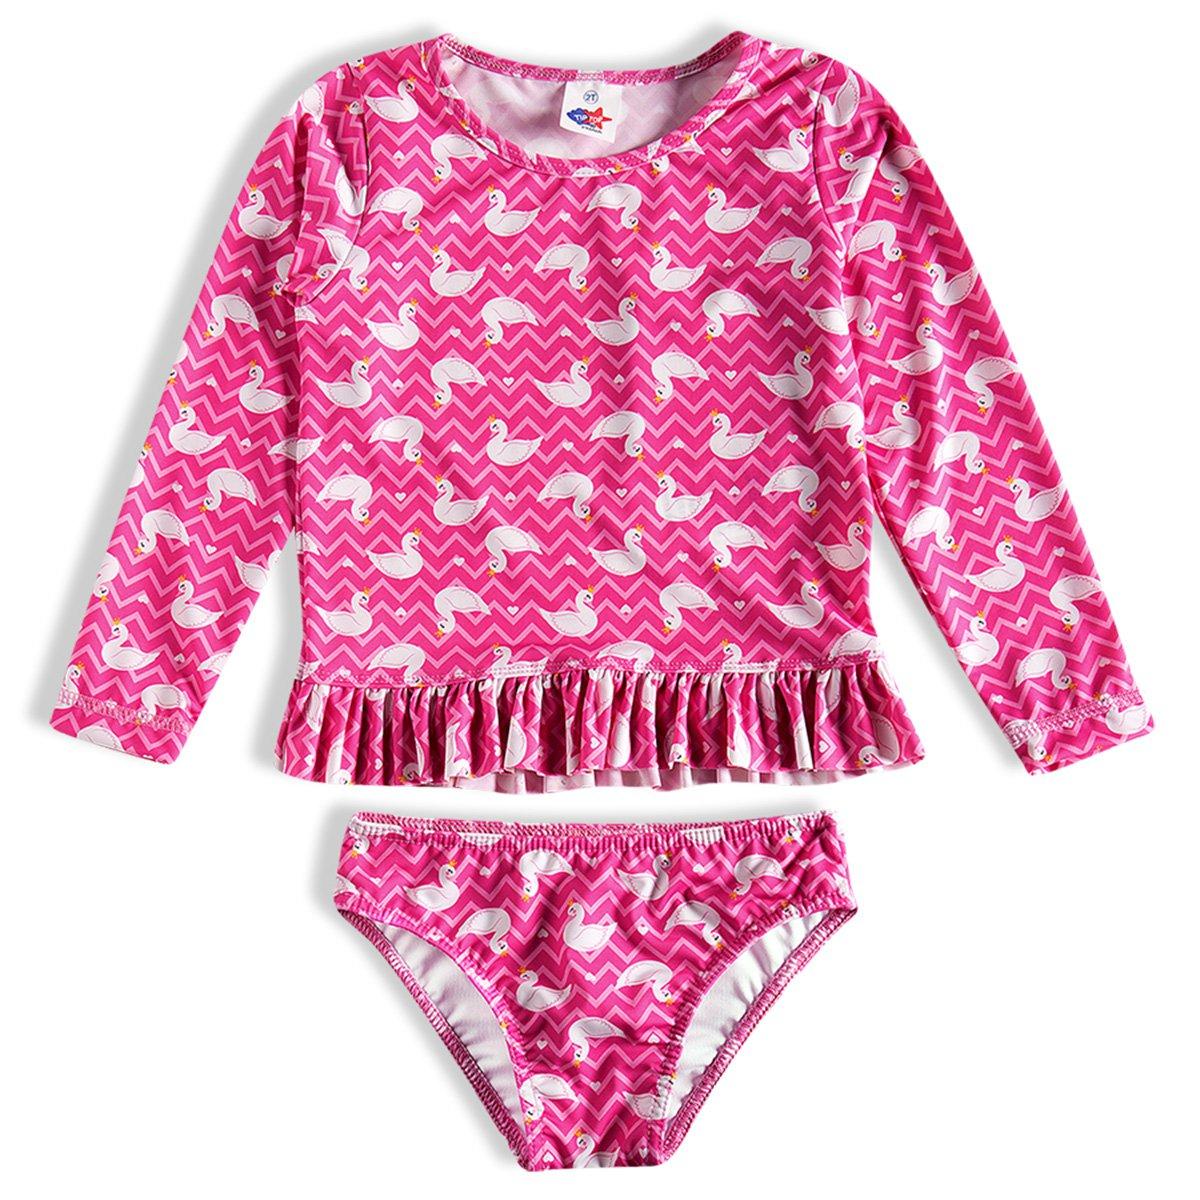 Conjunto Praia Toddler Tip Top Estampado Feminino